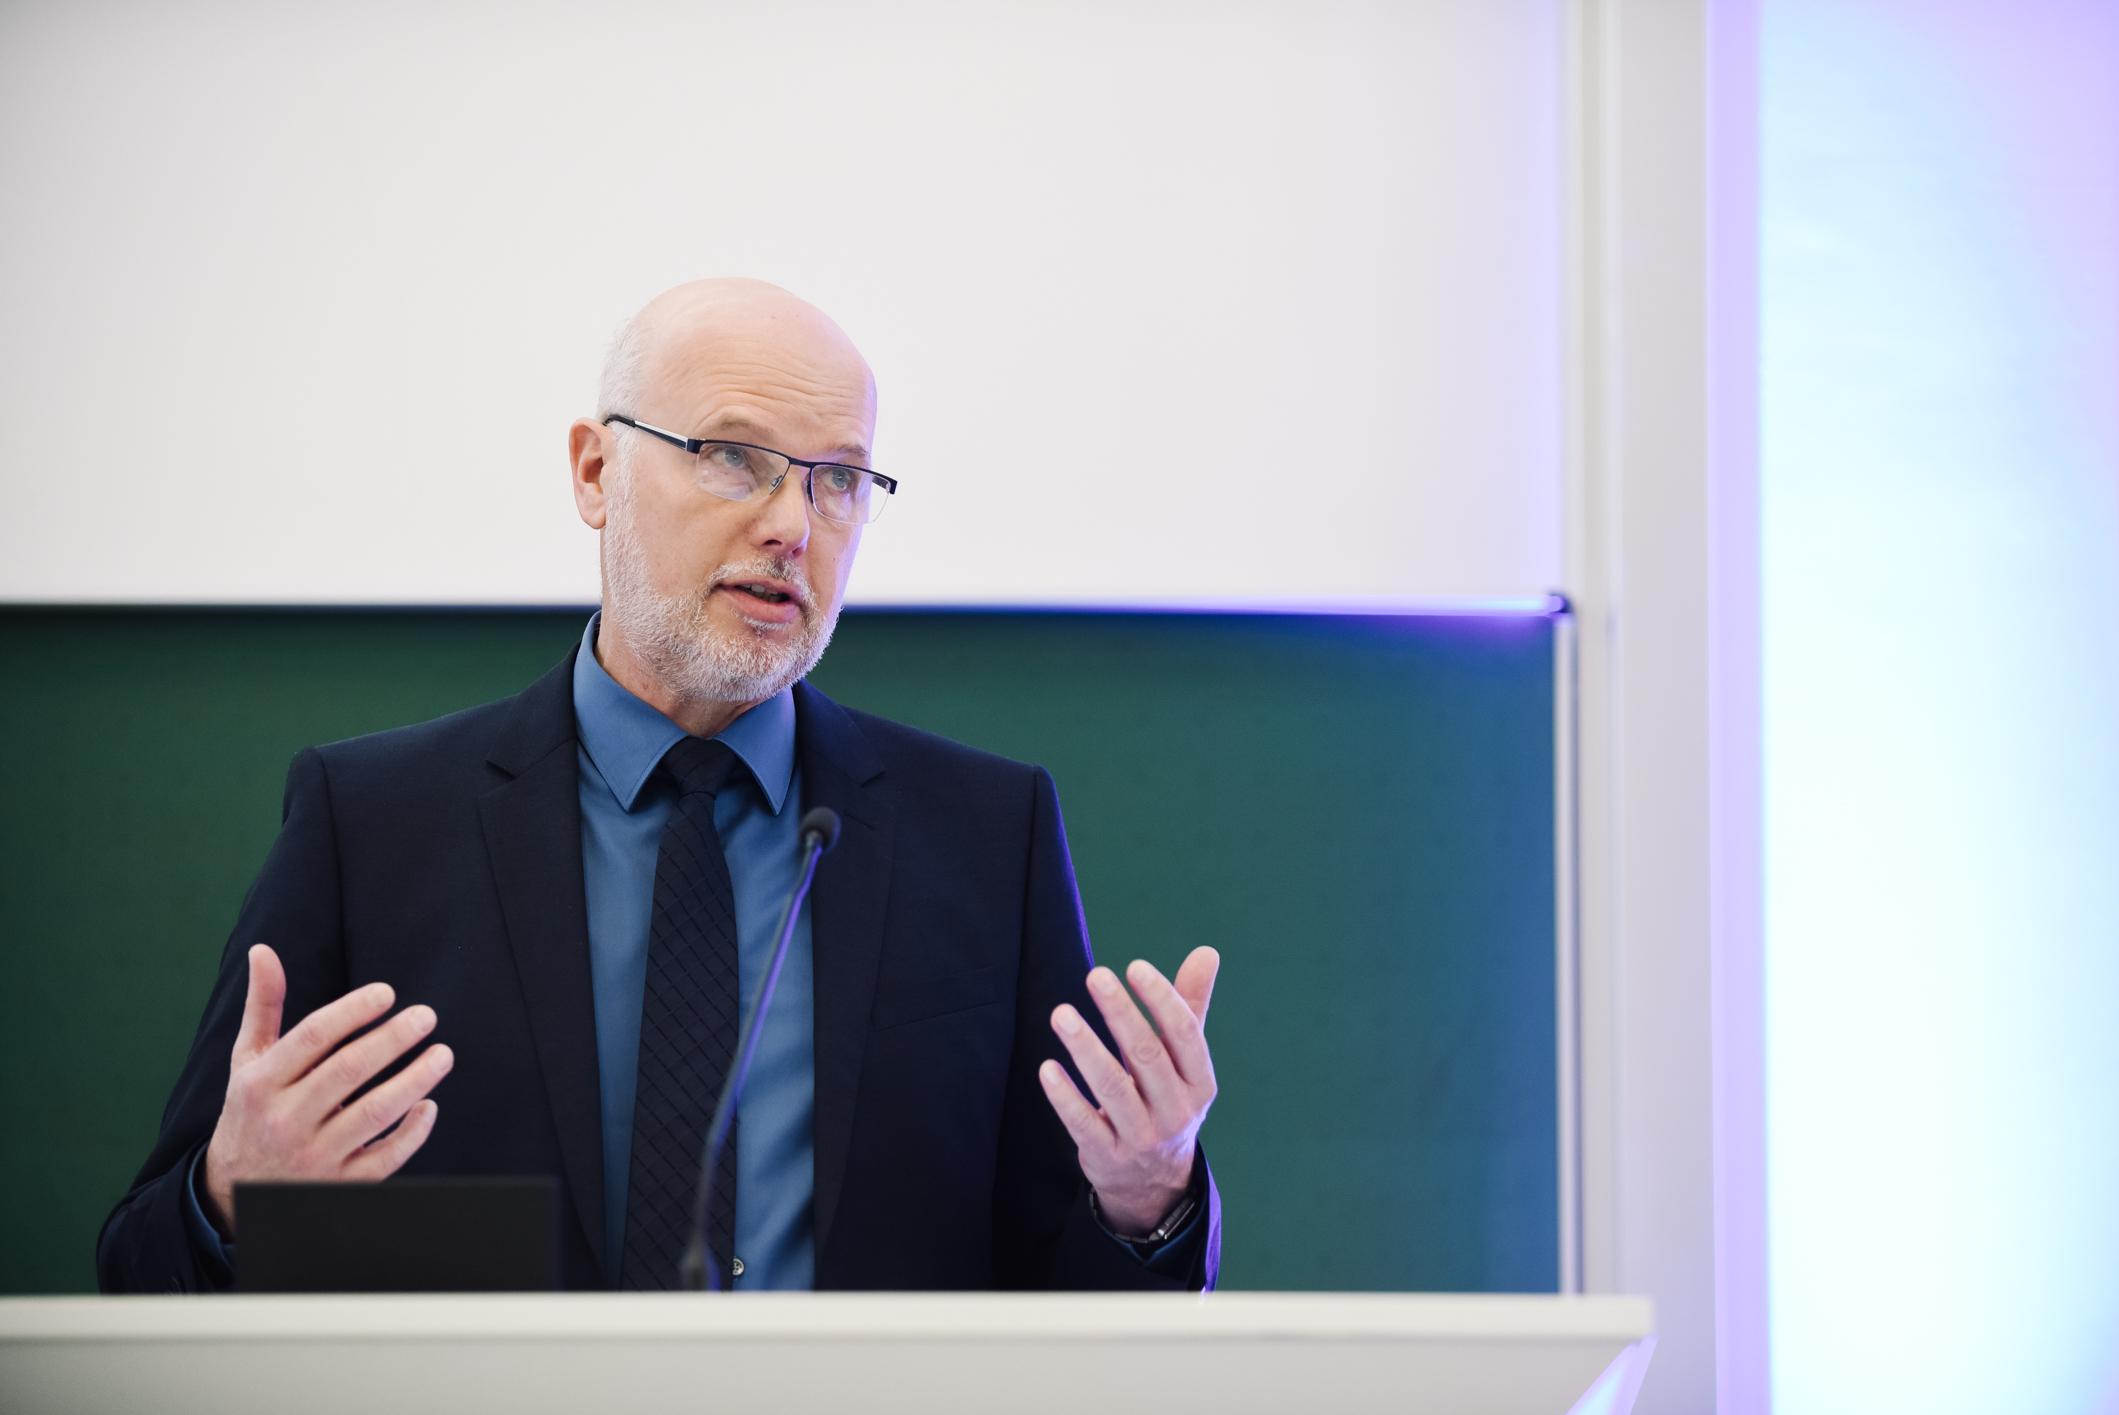 Prof. Dr. Bernd Boiting